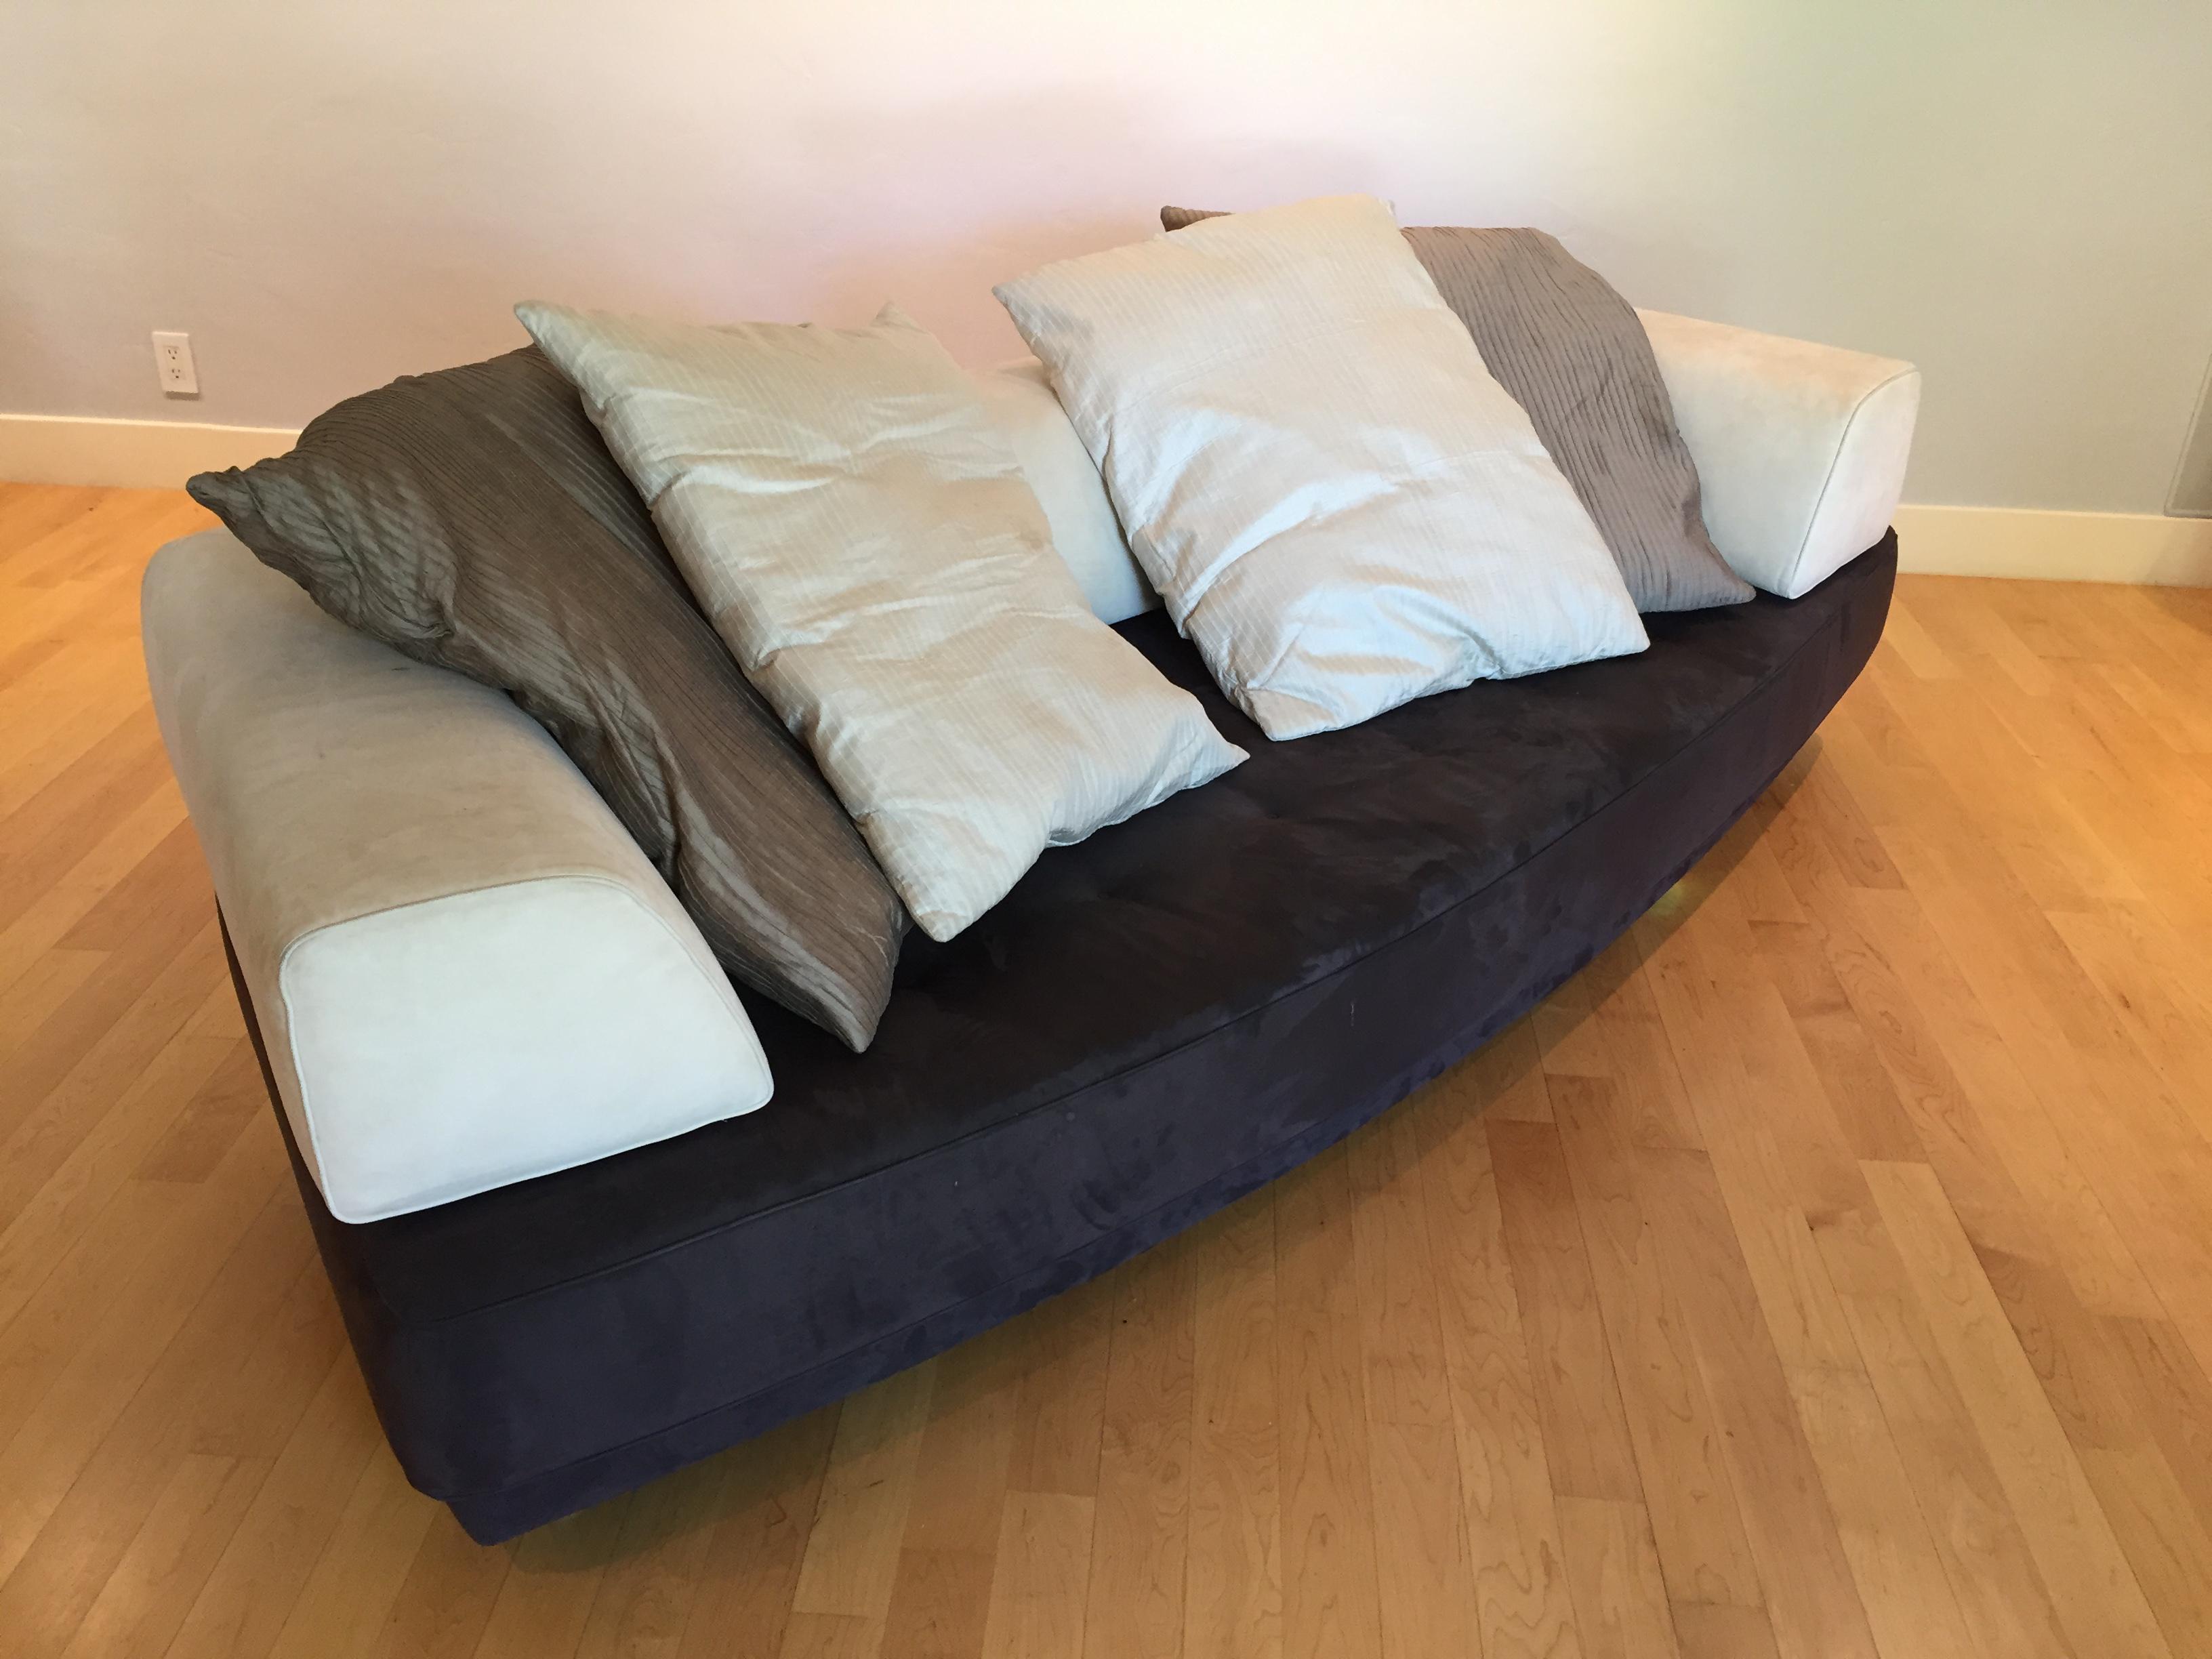 roche bobois floor cushion seating. Roche Bobois Modern 3-Seat Sofa With 4 Silk Pillows - Image 3 Of 5 Floor Cushion Seating